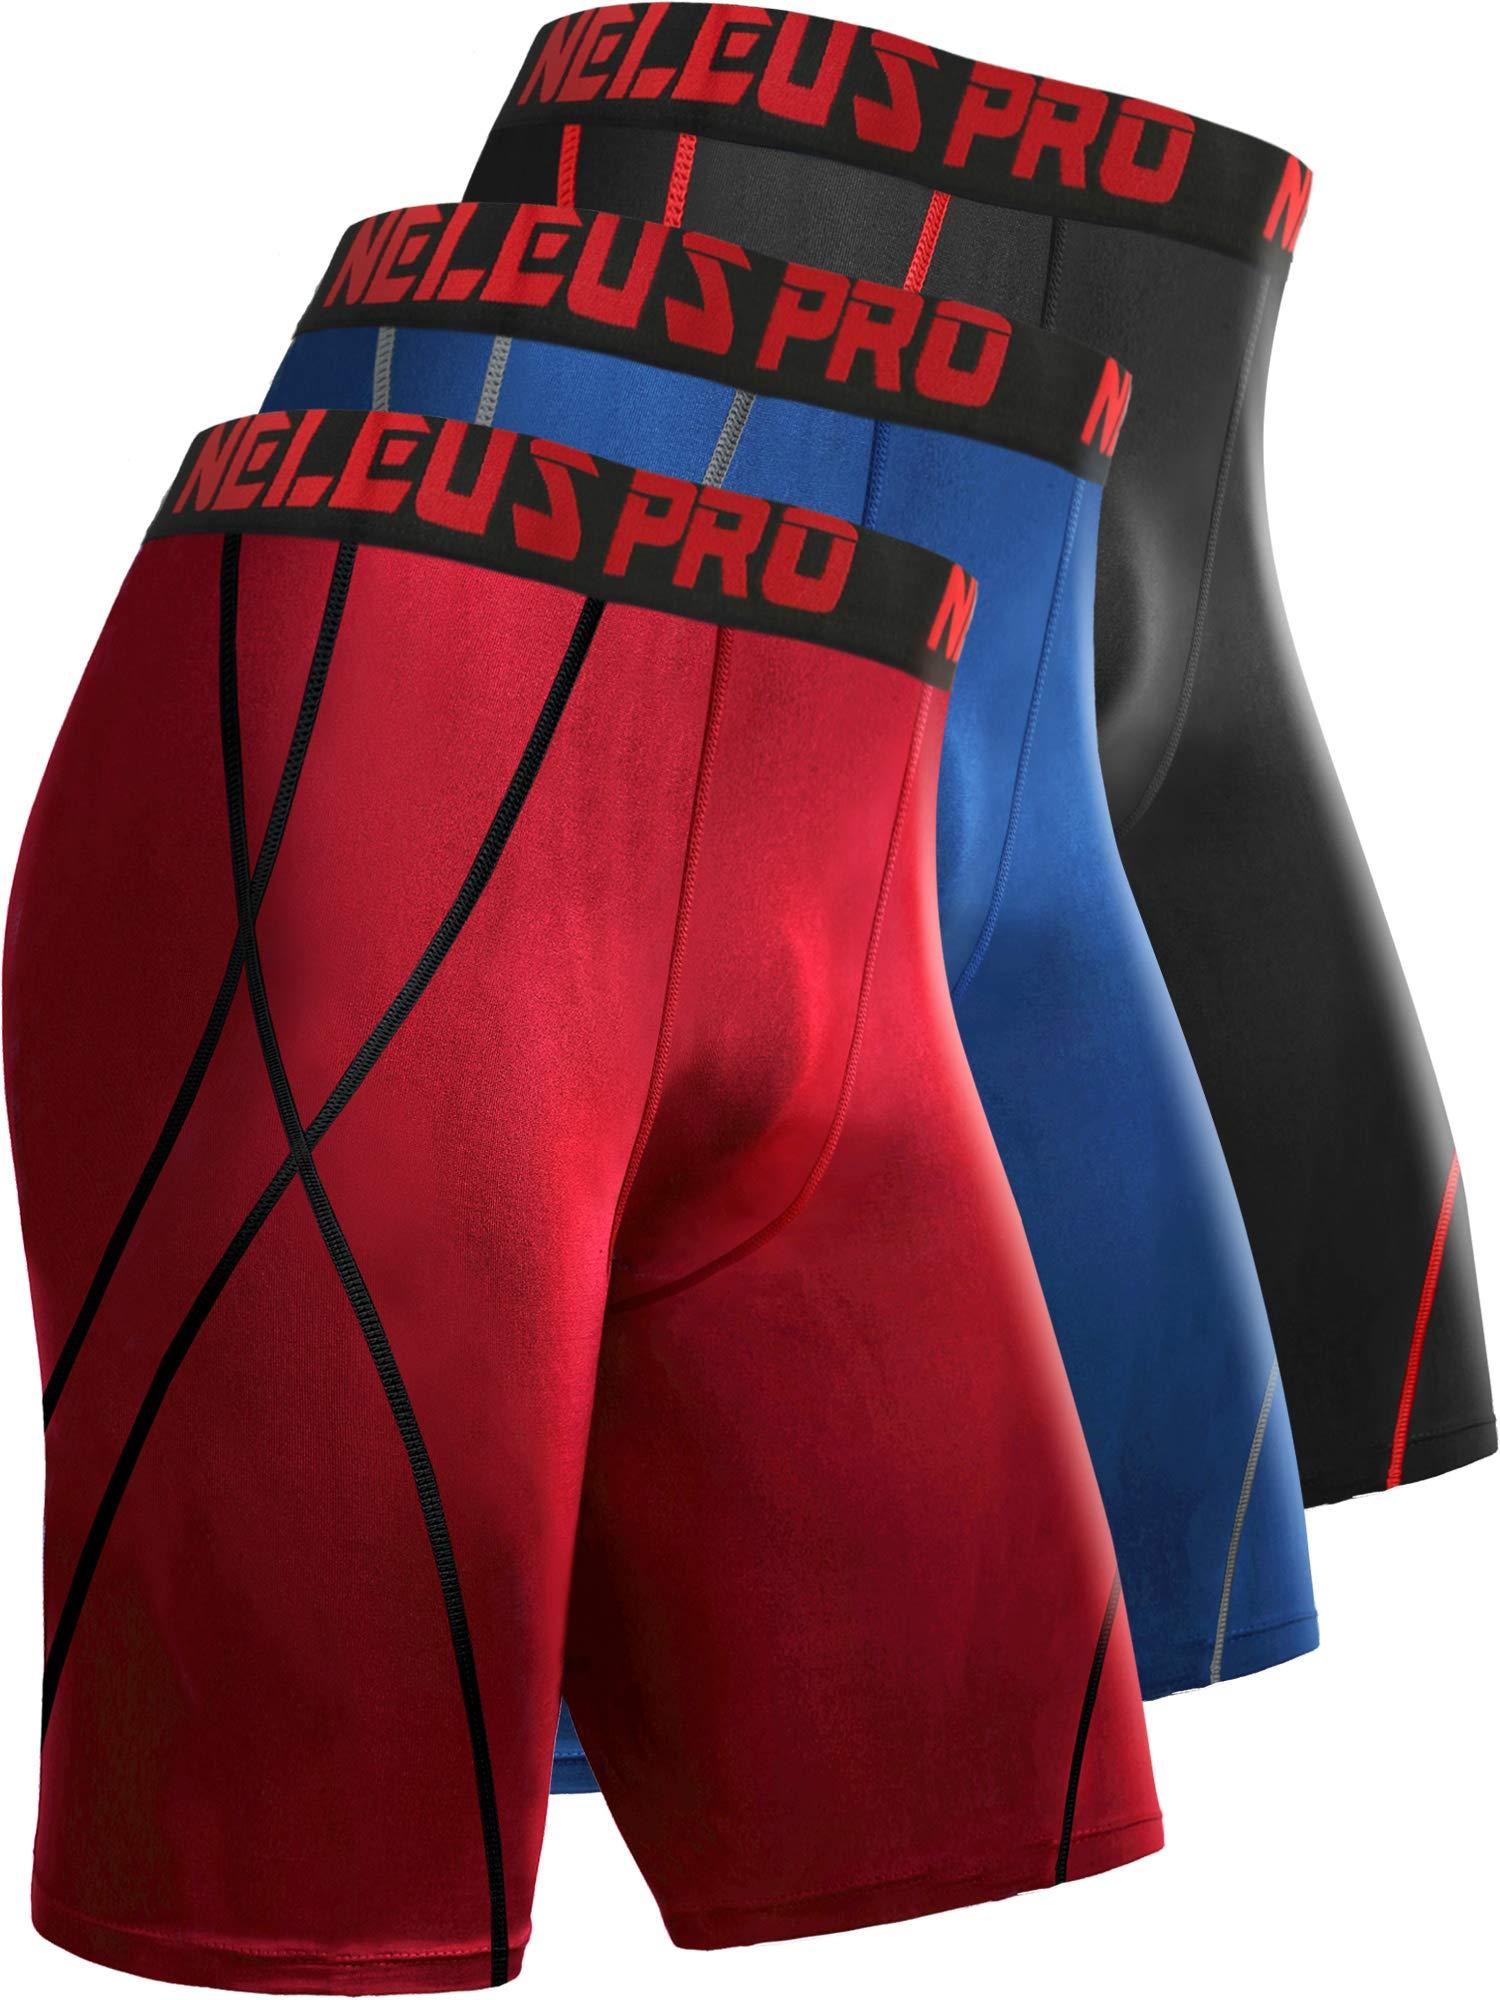 Neleus Men's 8 inch Compression Shorts,6010,3 Pack:Black,Blue,red,L,EU XL by Neleus